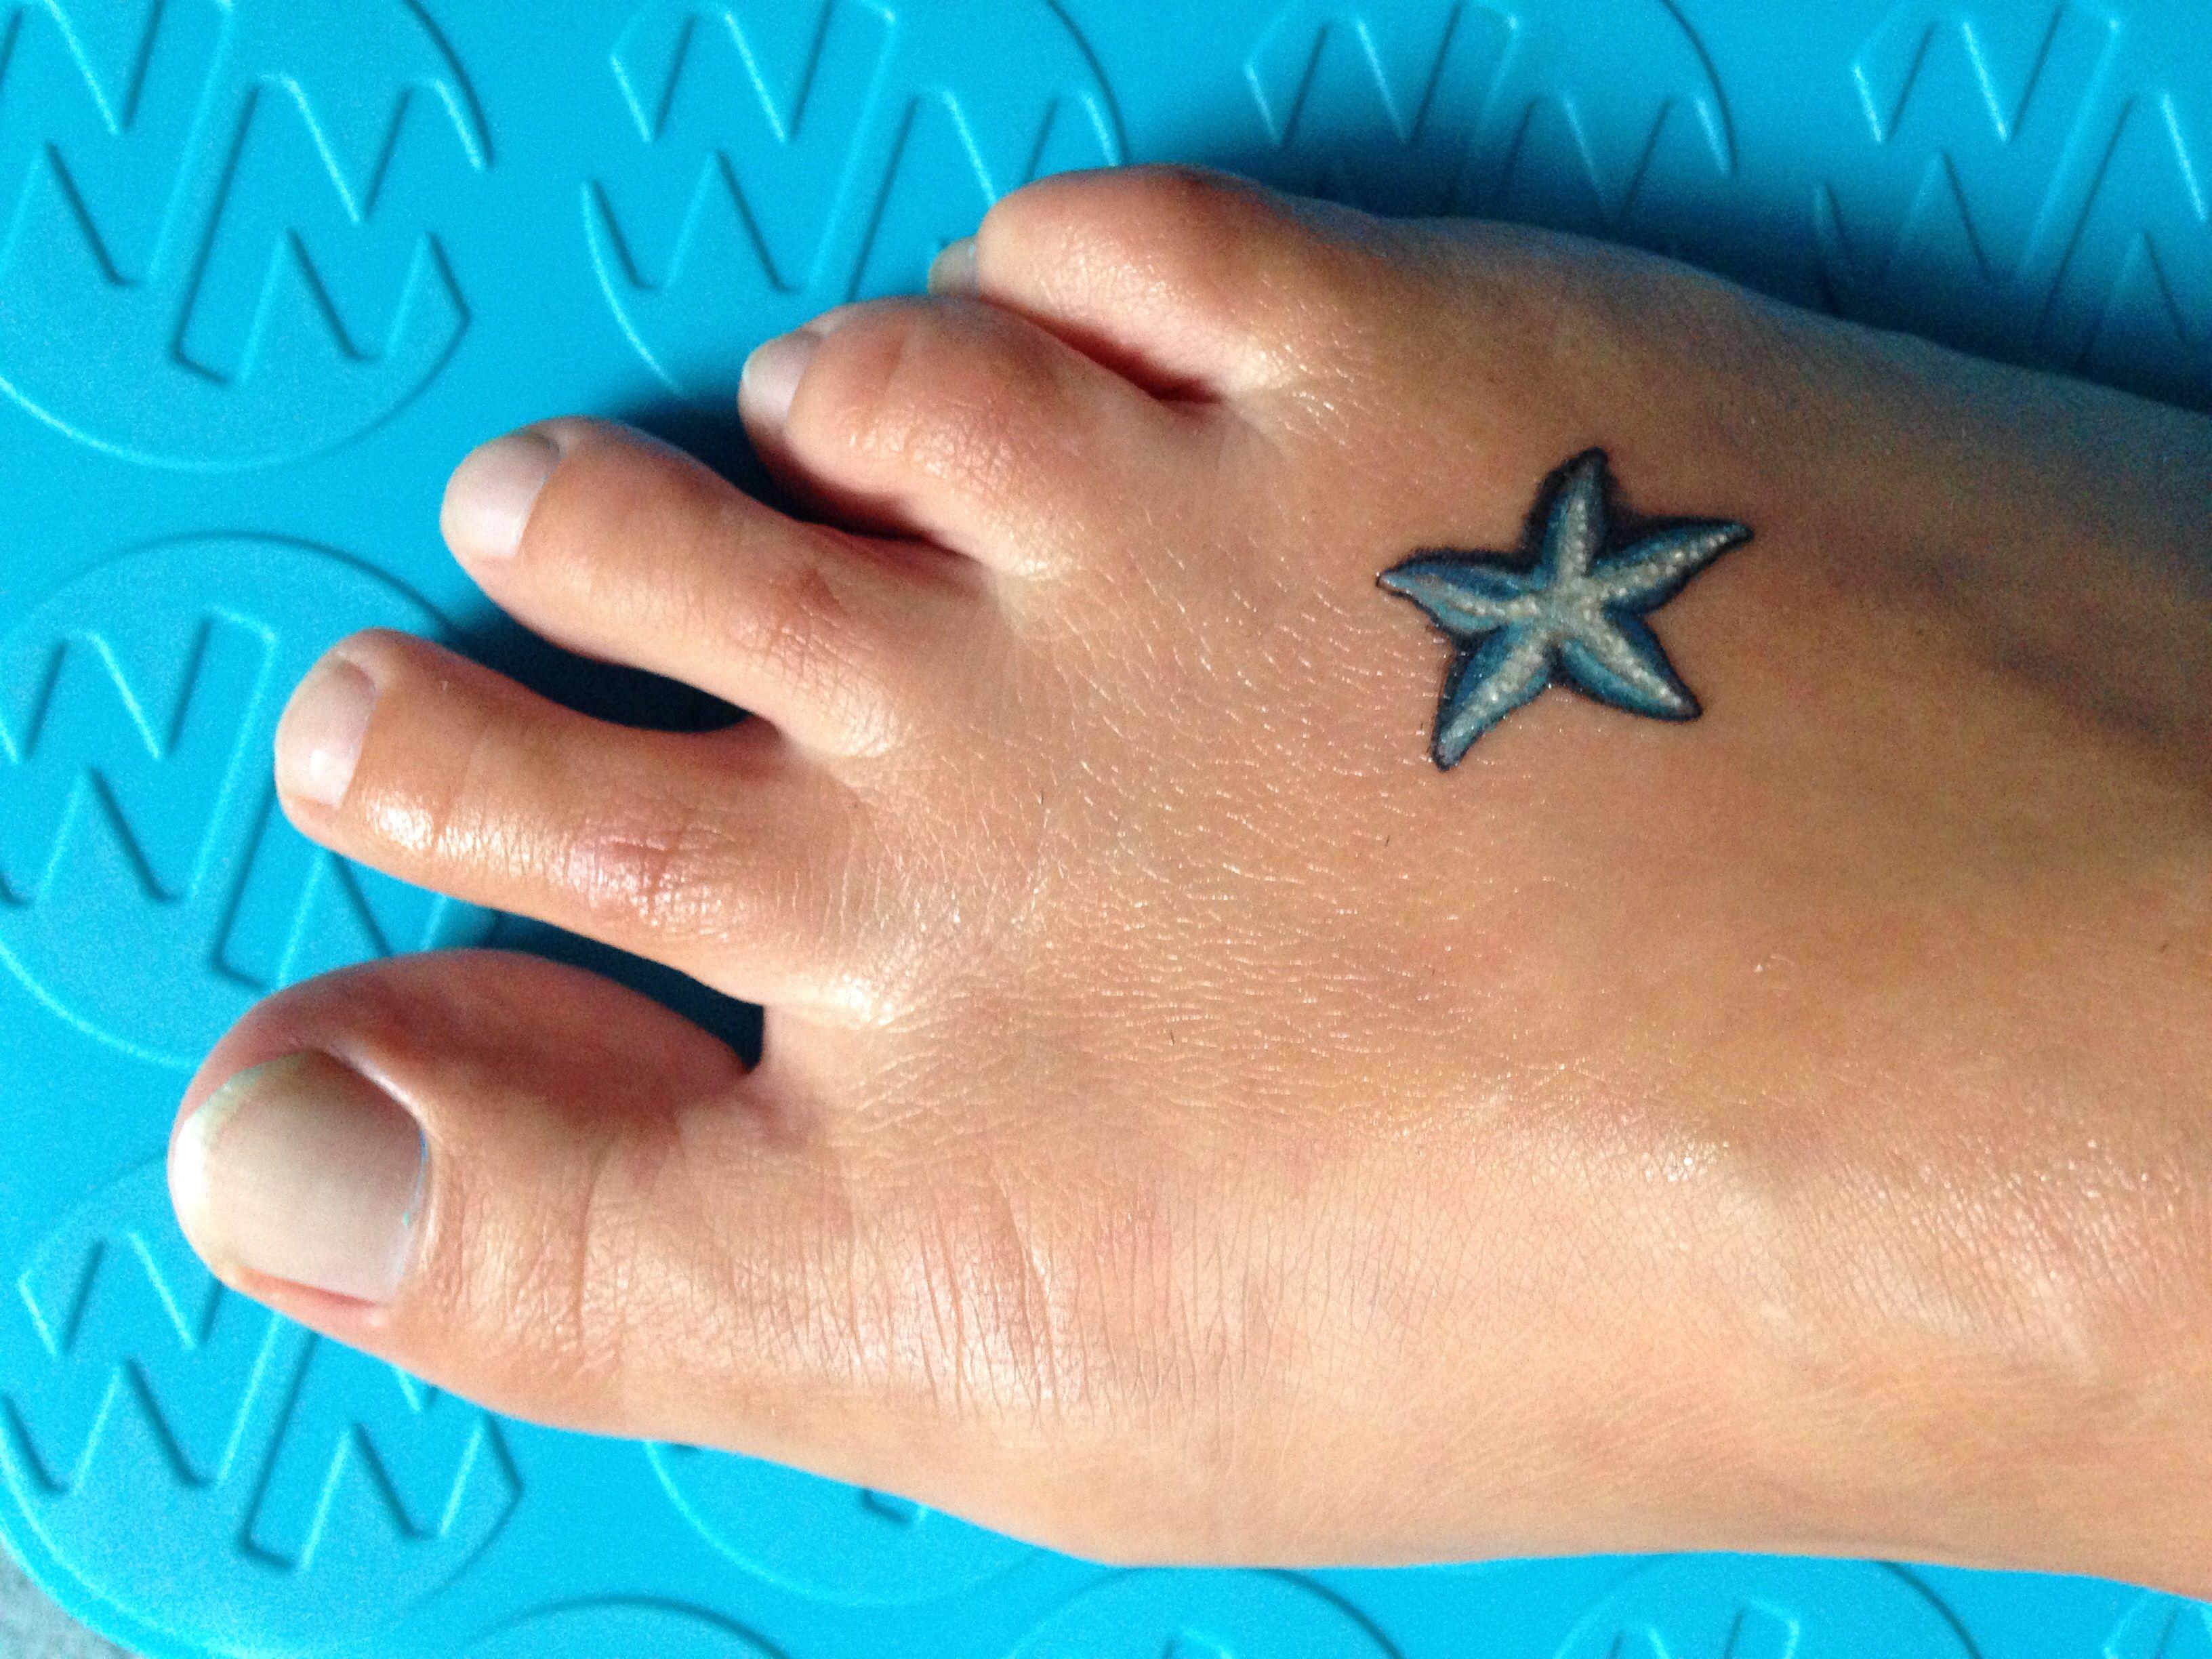 small starfish tattoo my style pinterest starfish tattoo and tatting. Black Bedroom Furniture Sets. Home Design Ideas